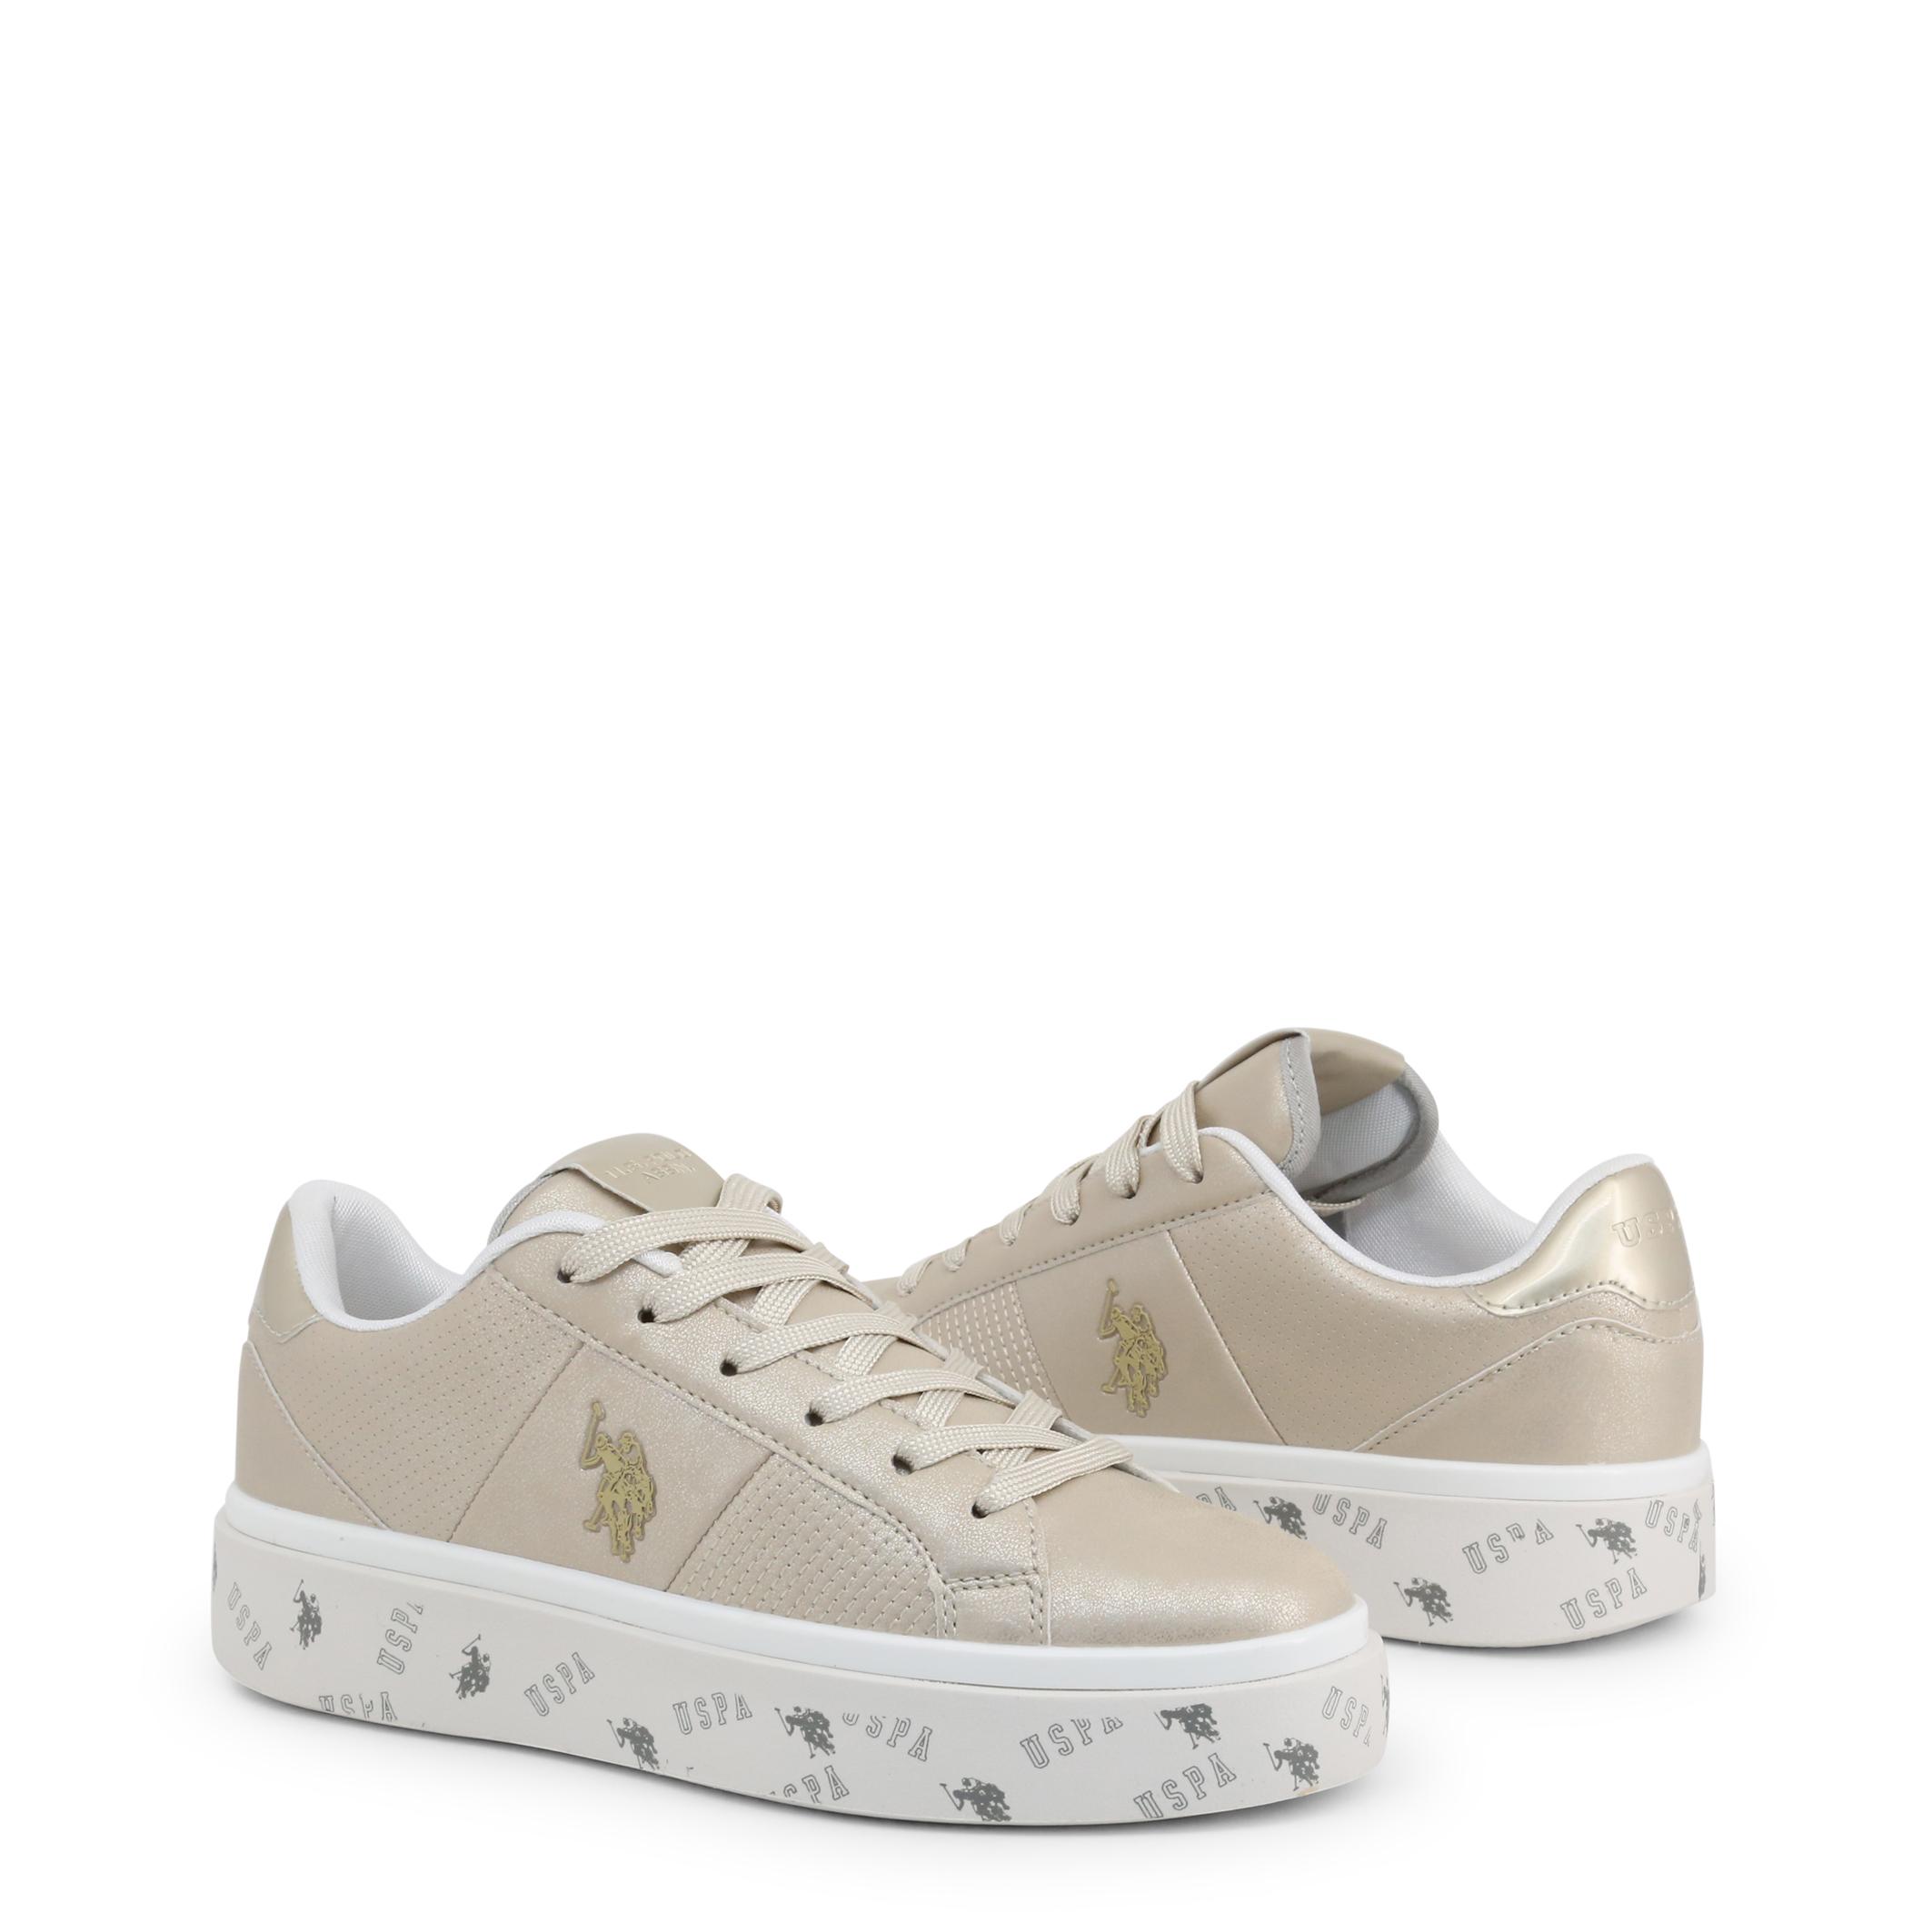 Baskets / Sneakers  U.S. Polo Assn. LUCY4119S0_Y1_LIGO brown